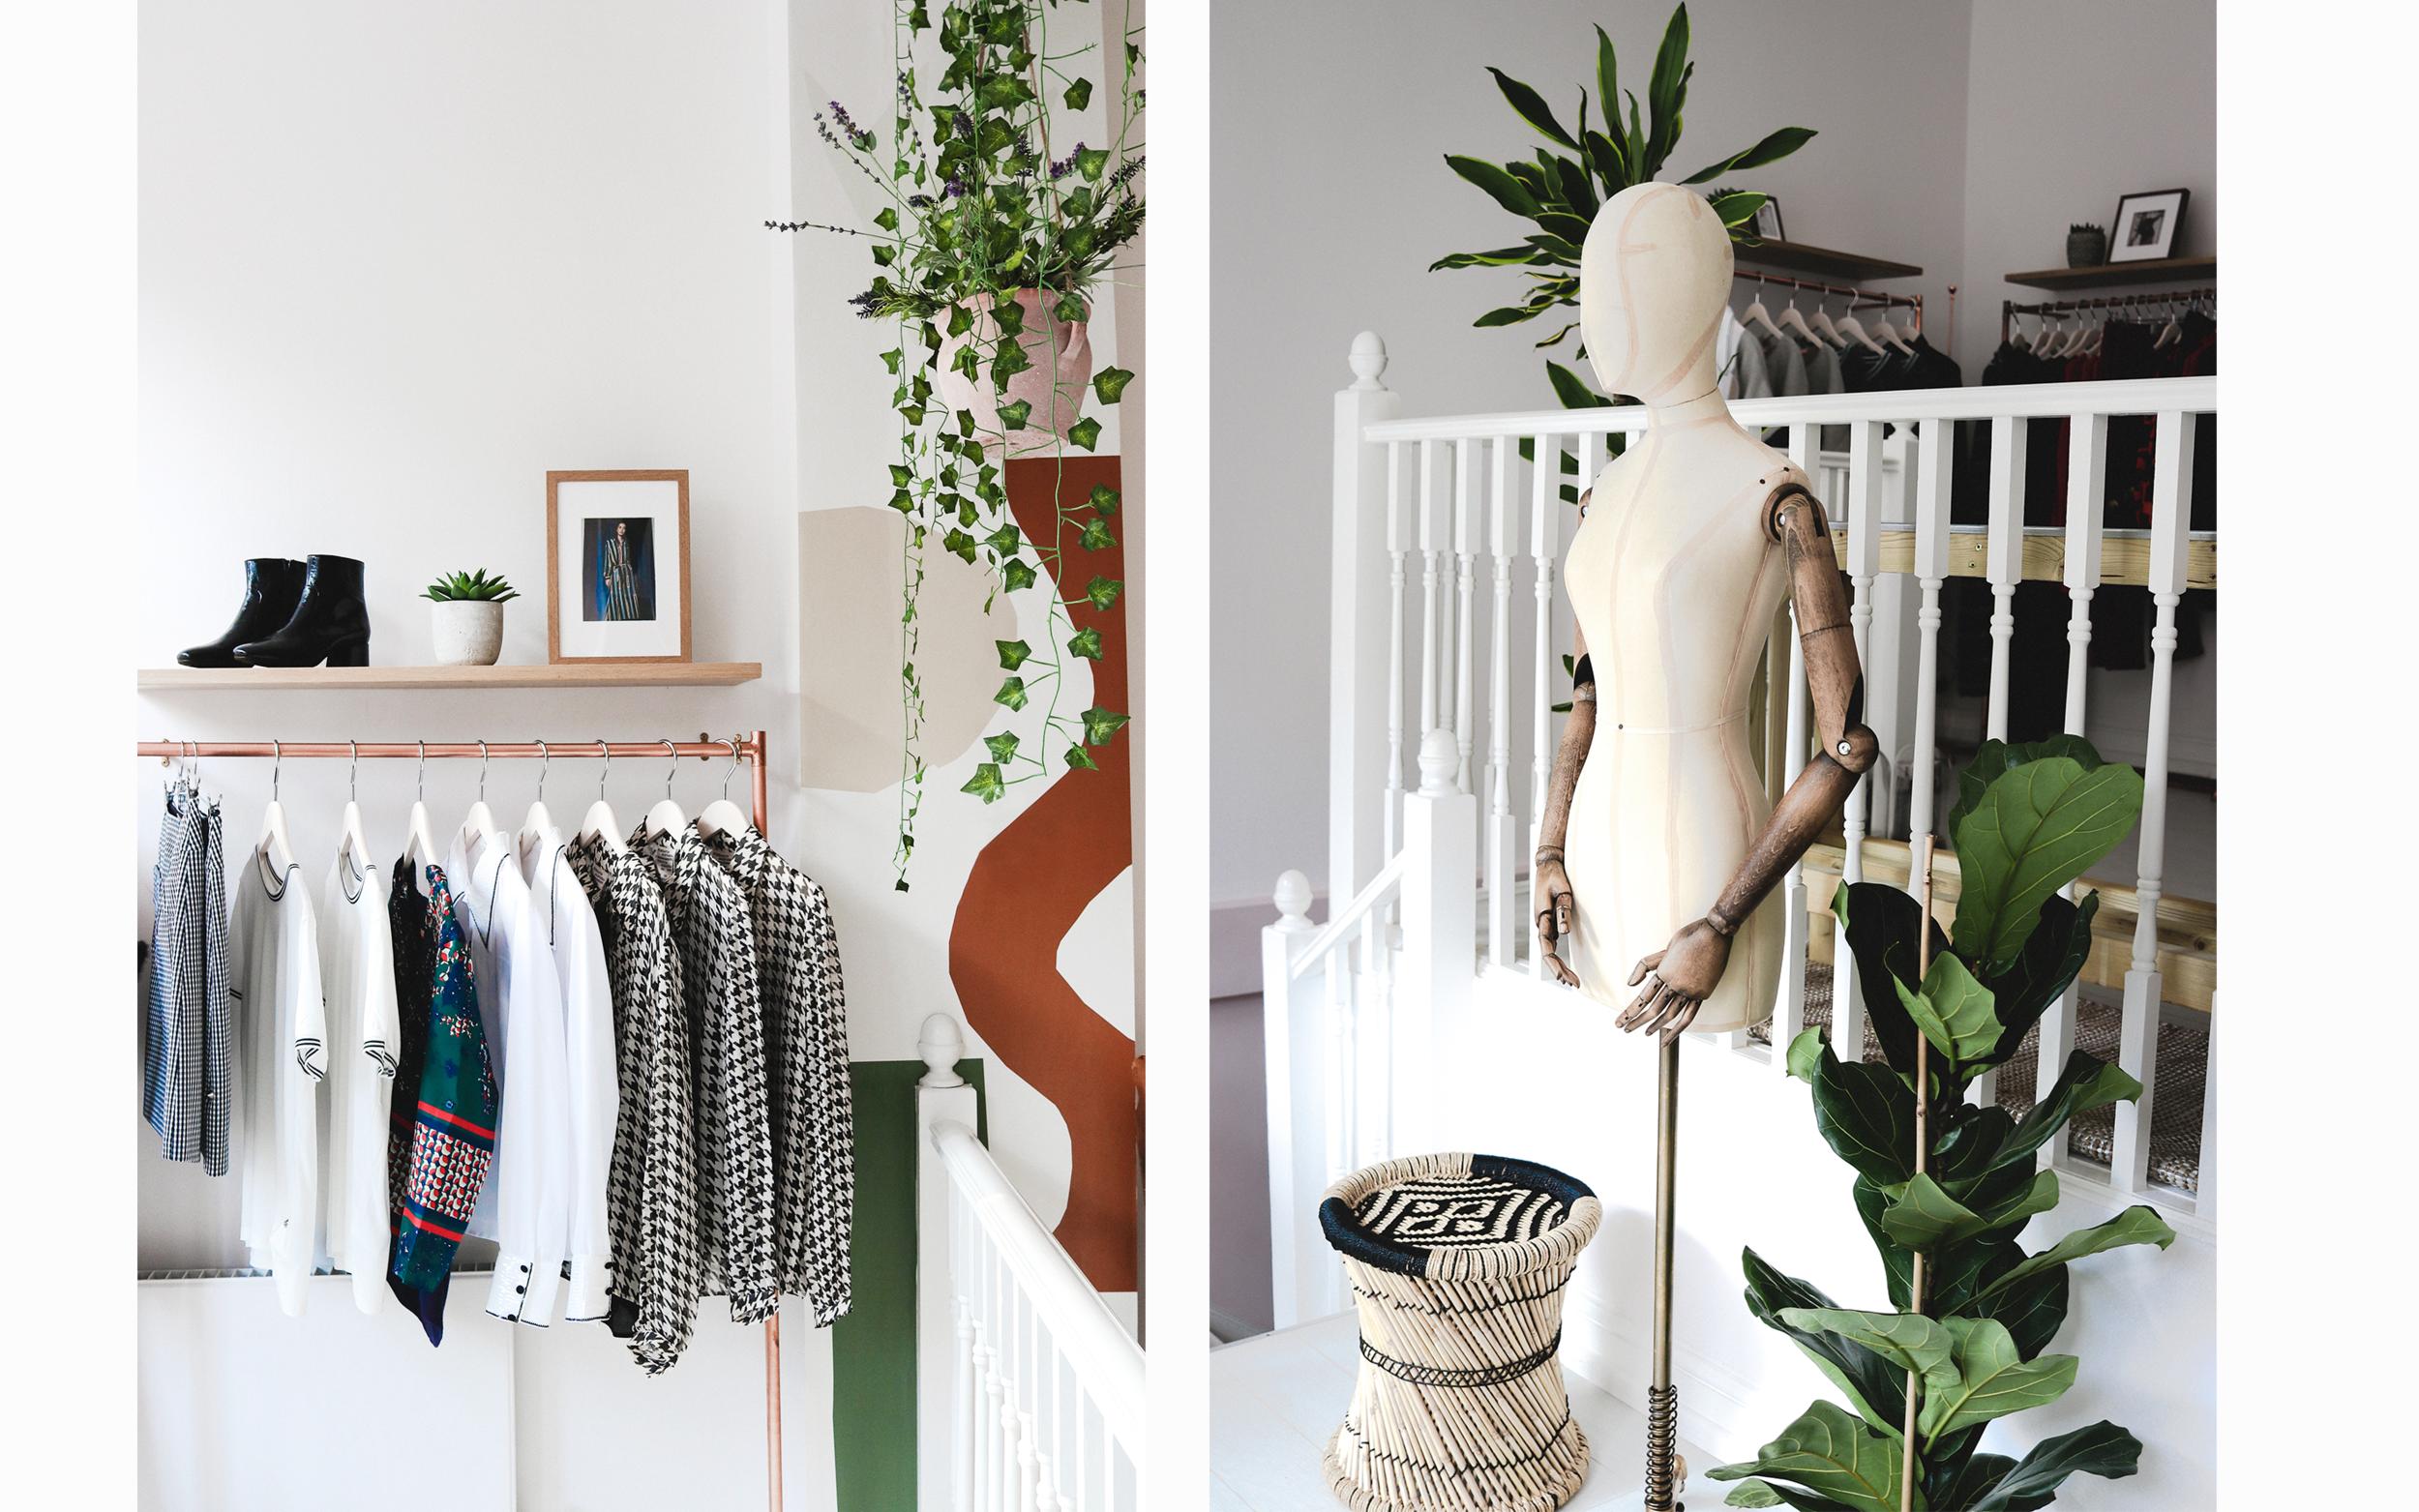 House of Sui Sui - Melissa Bolivar - Pamela Shiffer Primrose Hill. Interior Retail Design 1.png